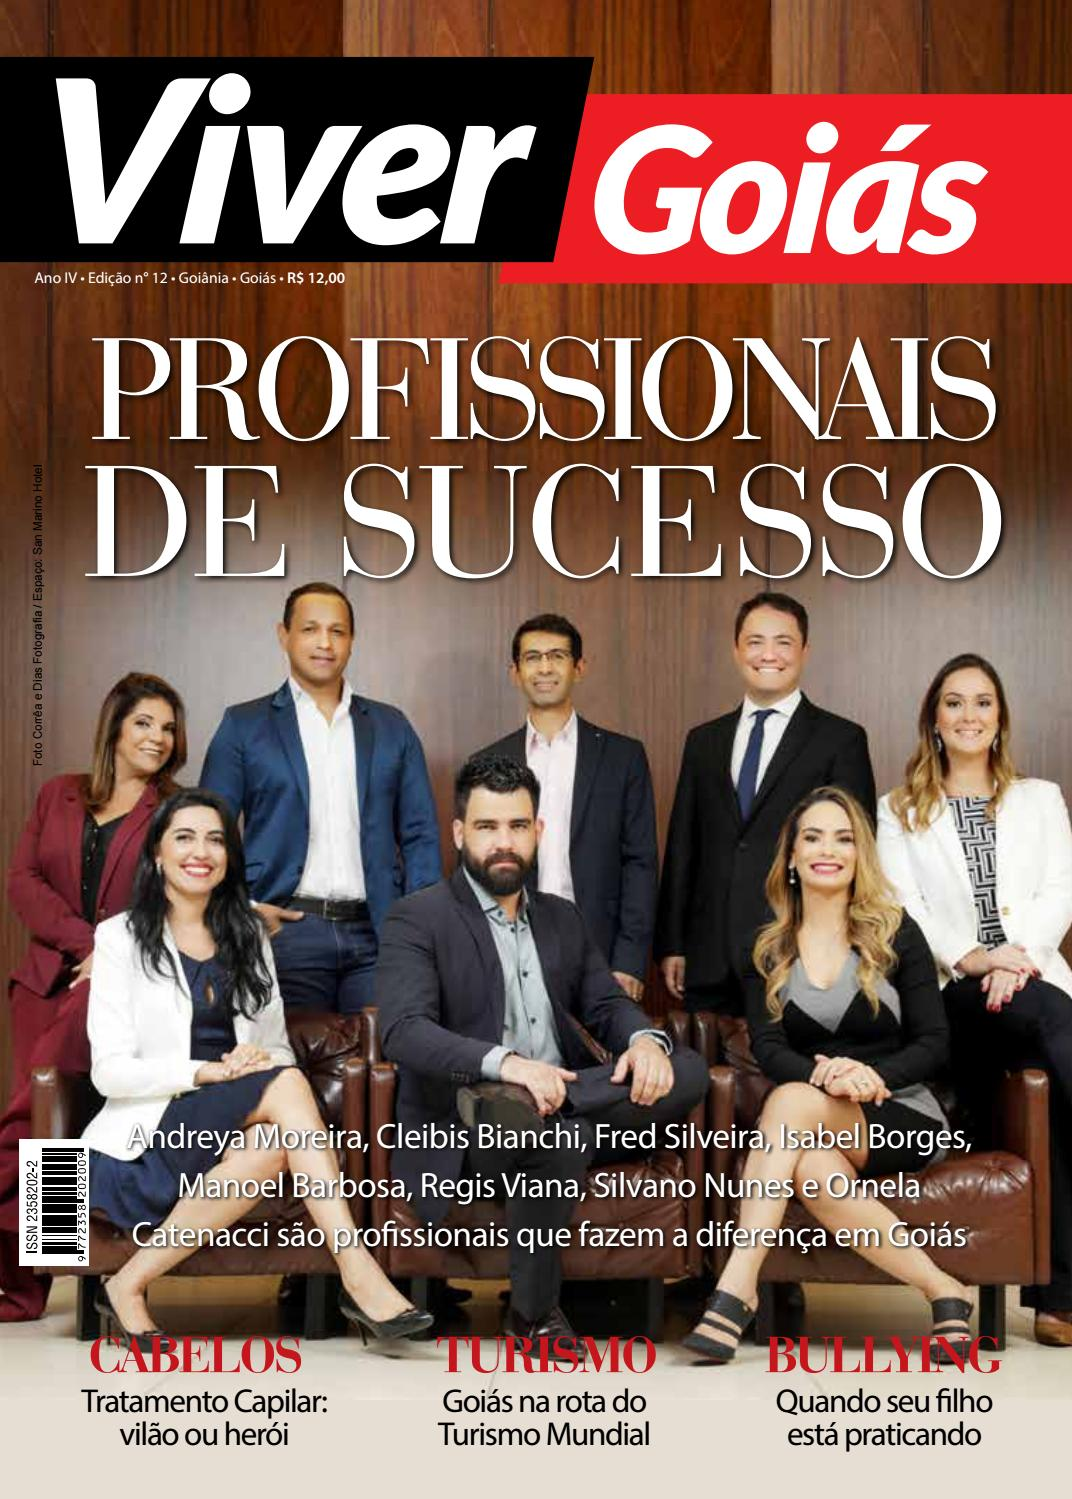 Revista Viver Goiás by Brenno Alves - issuu dde92633b2